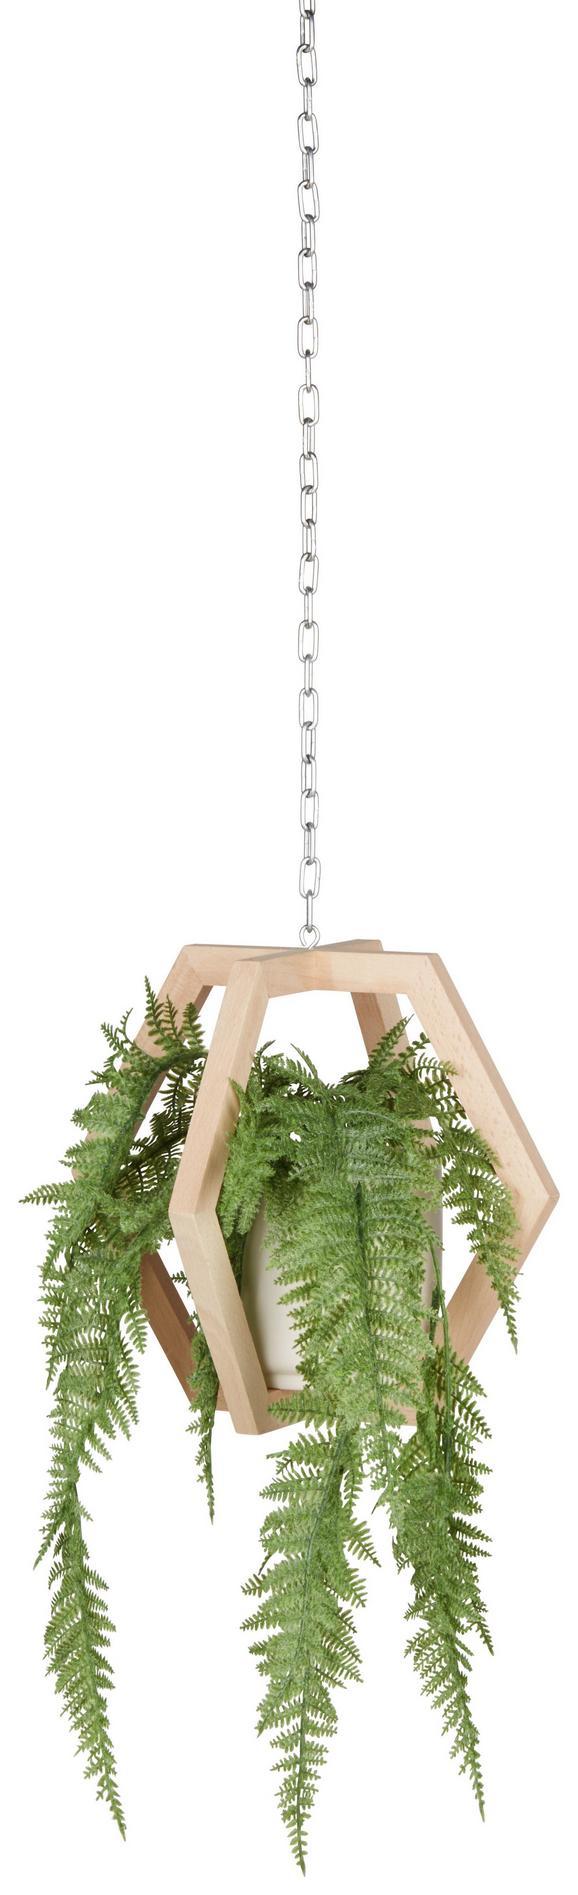 Pflantopfhänger Felix in Naturfarben - Creme/Naturfarben, Holz/Keramik (28/24,3cm) - Mömax modern living